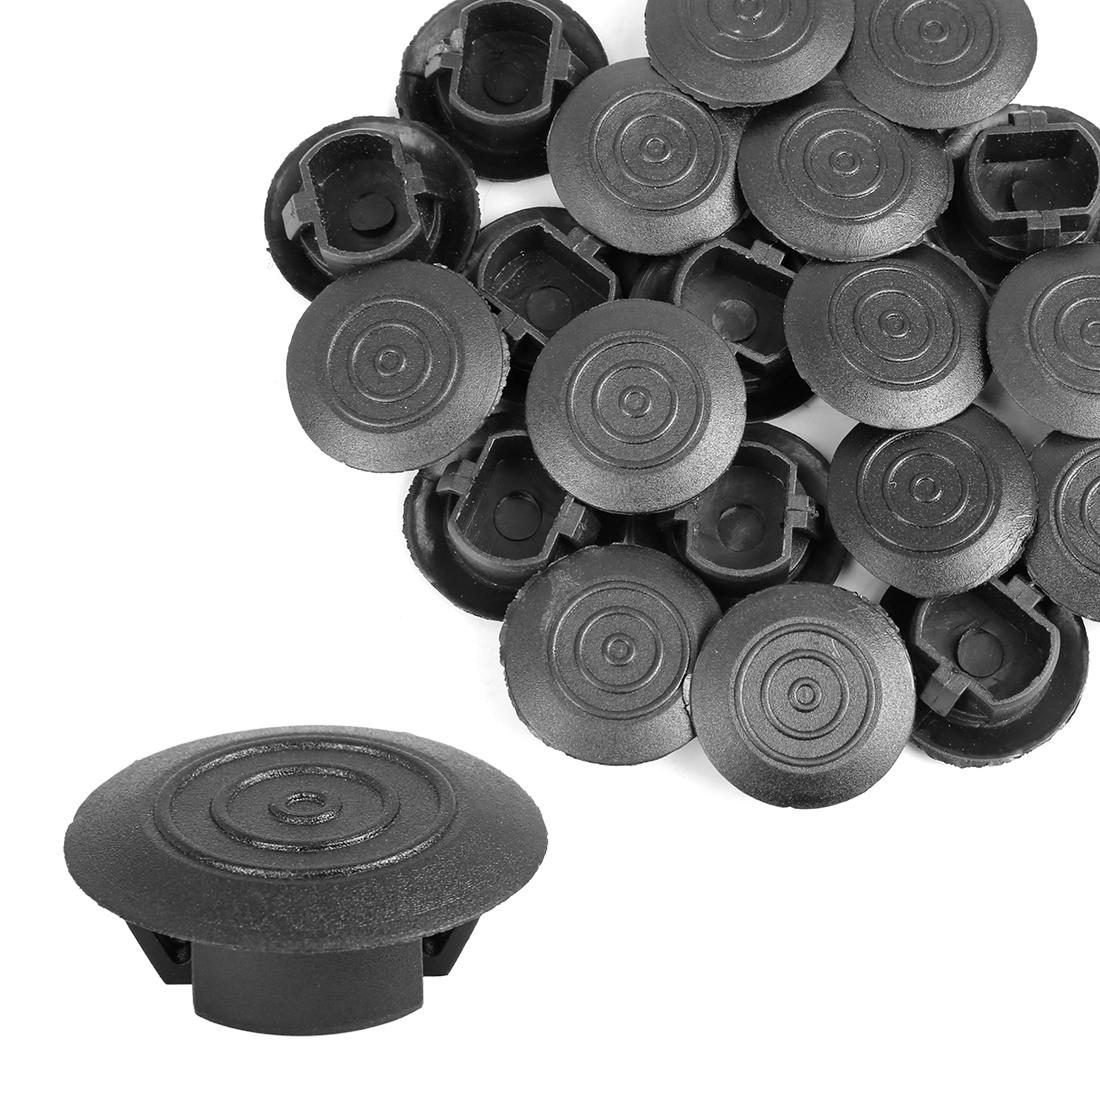 20pcs Nylon Panel Moulding Retainer Clips for Toyota Scion Pontiac 76924-52021